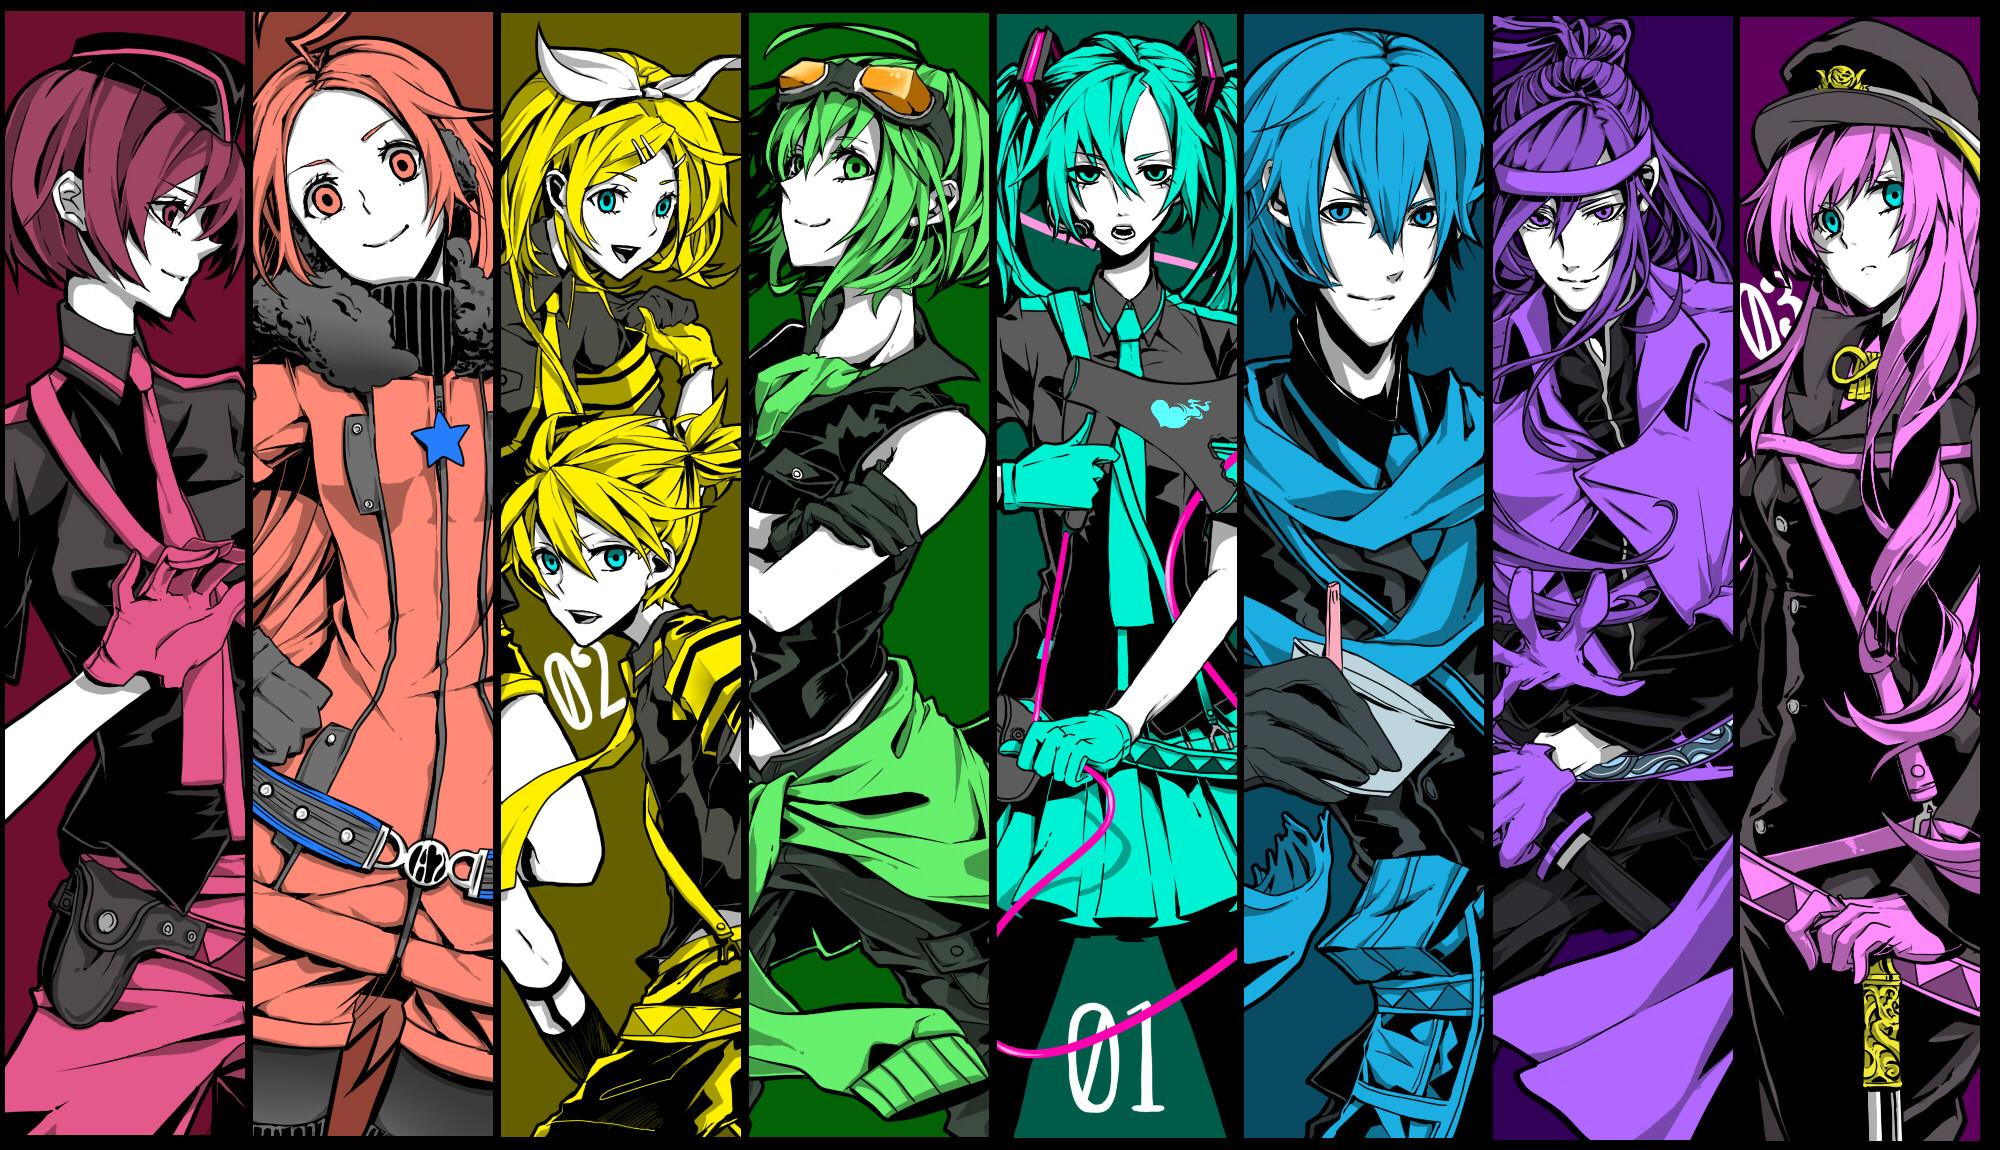 Vocaloid Wallpaper Pack (61+ images)